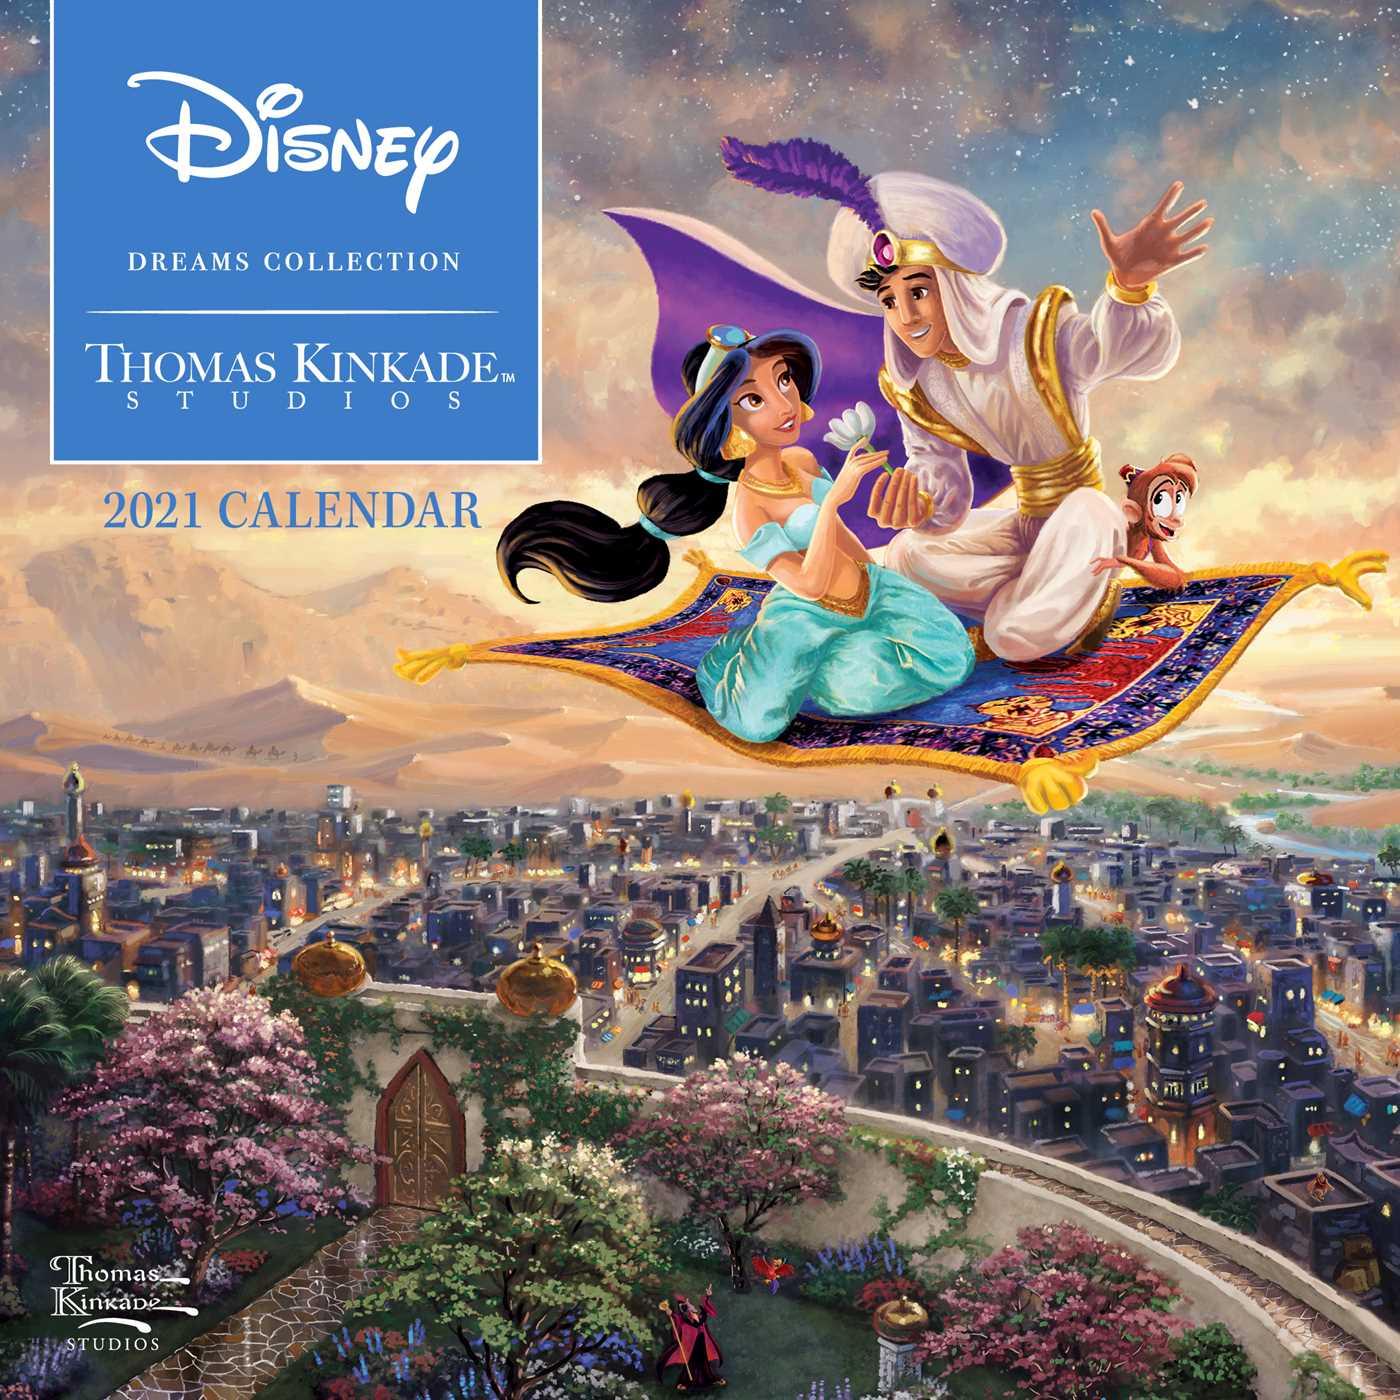 Thomas Kinkade Disney Calendar 2021 Disney Dreams Collection by Thomas Kinkade Studios: 2021 Mini Wall